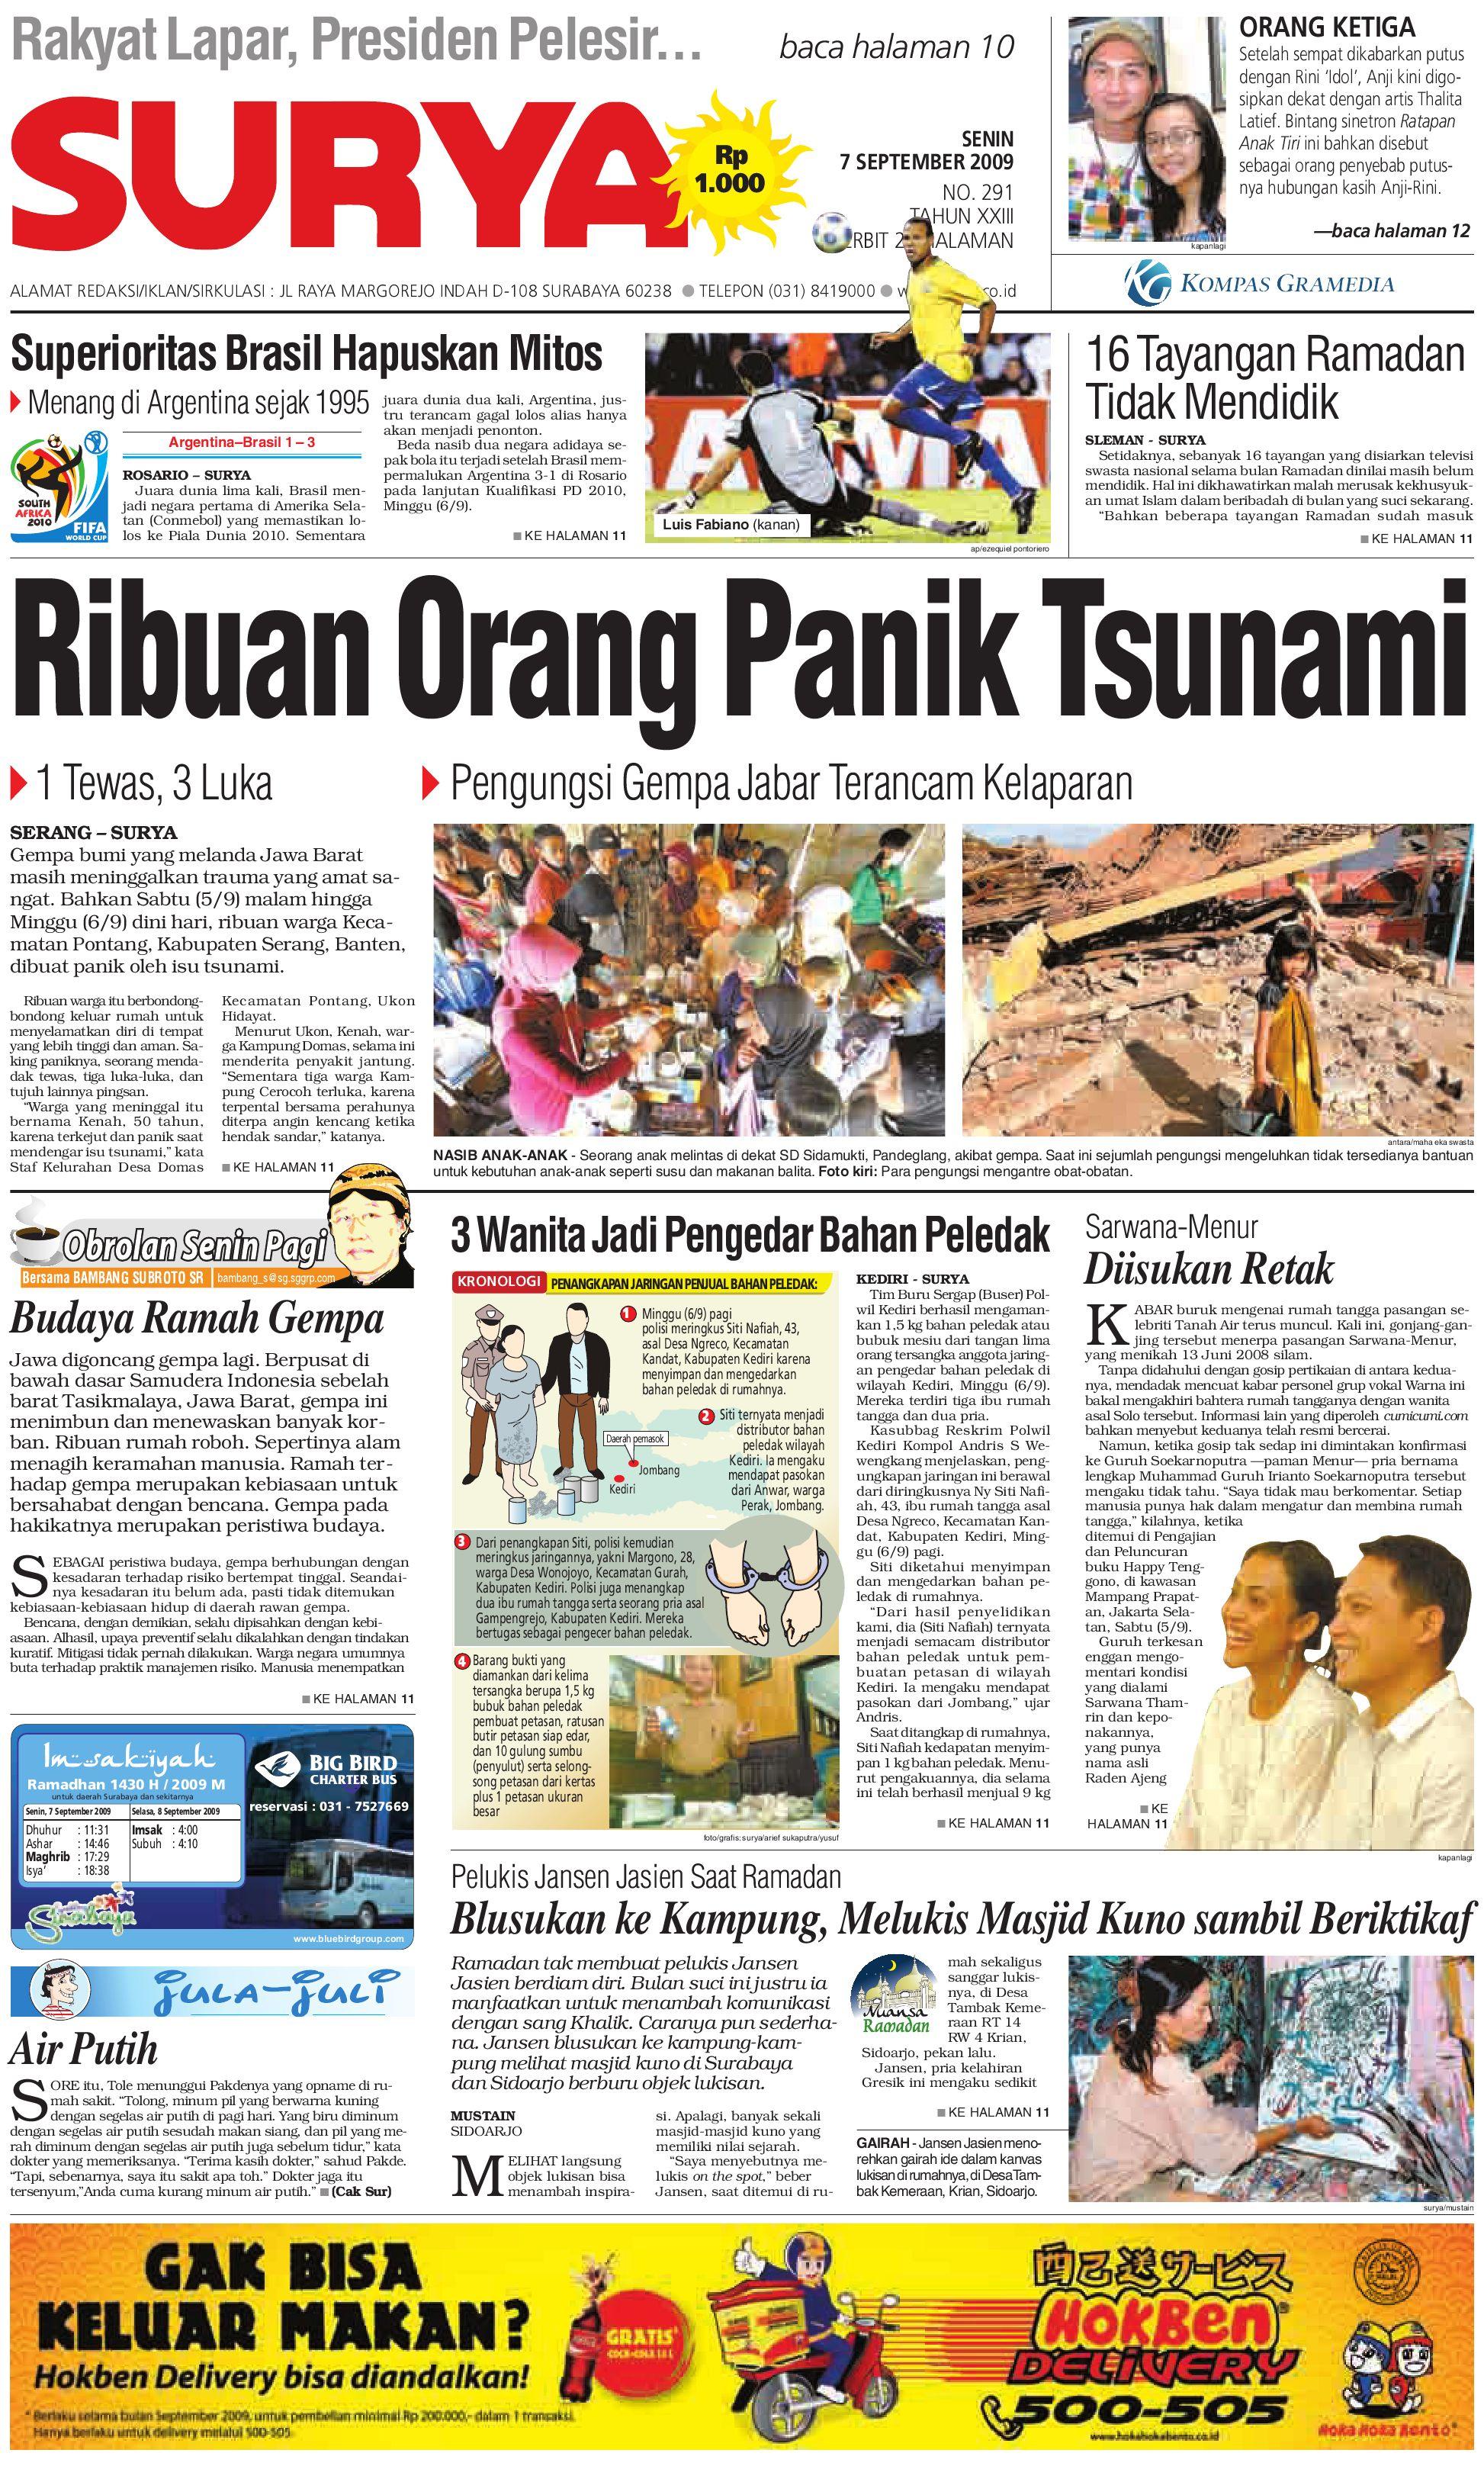 Paper Surya Edisi 27 Desember 2012 Harian Issuu Cetak 07